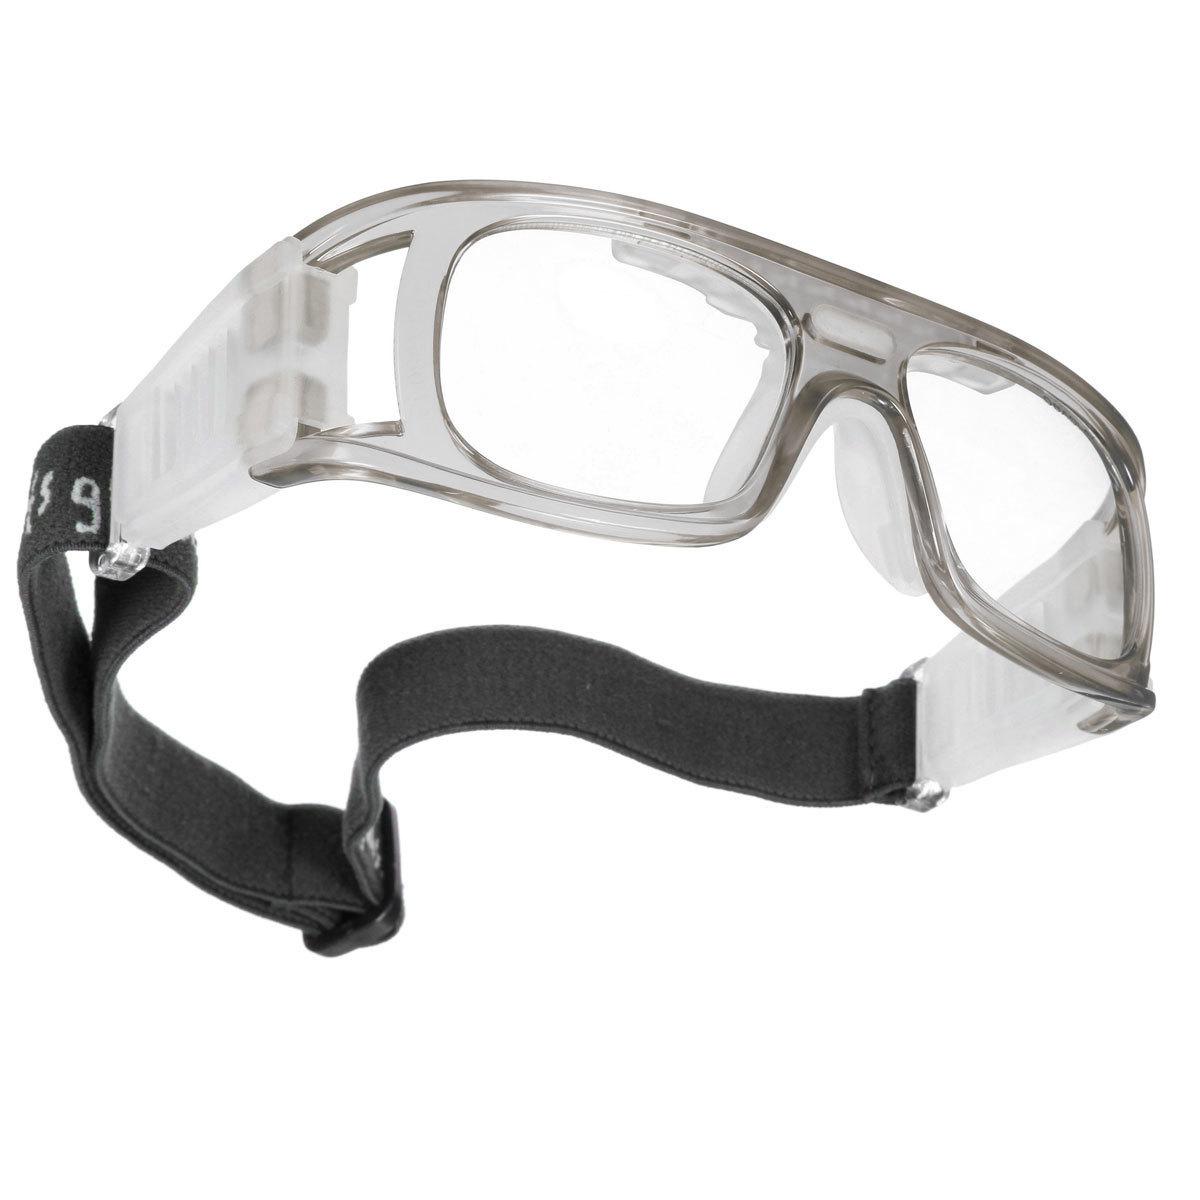 Olahraga Sepak Bola Basket Kacamata Pelindung Mata Kacamata Pengaman Pelindung Elastis Abu-